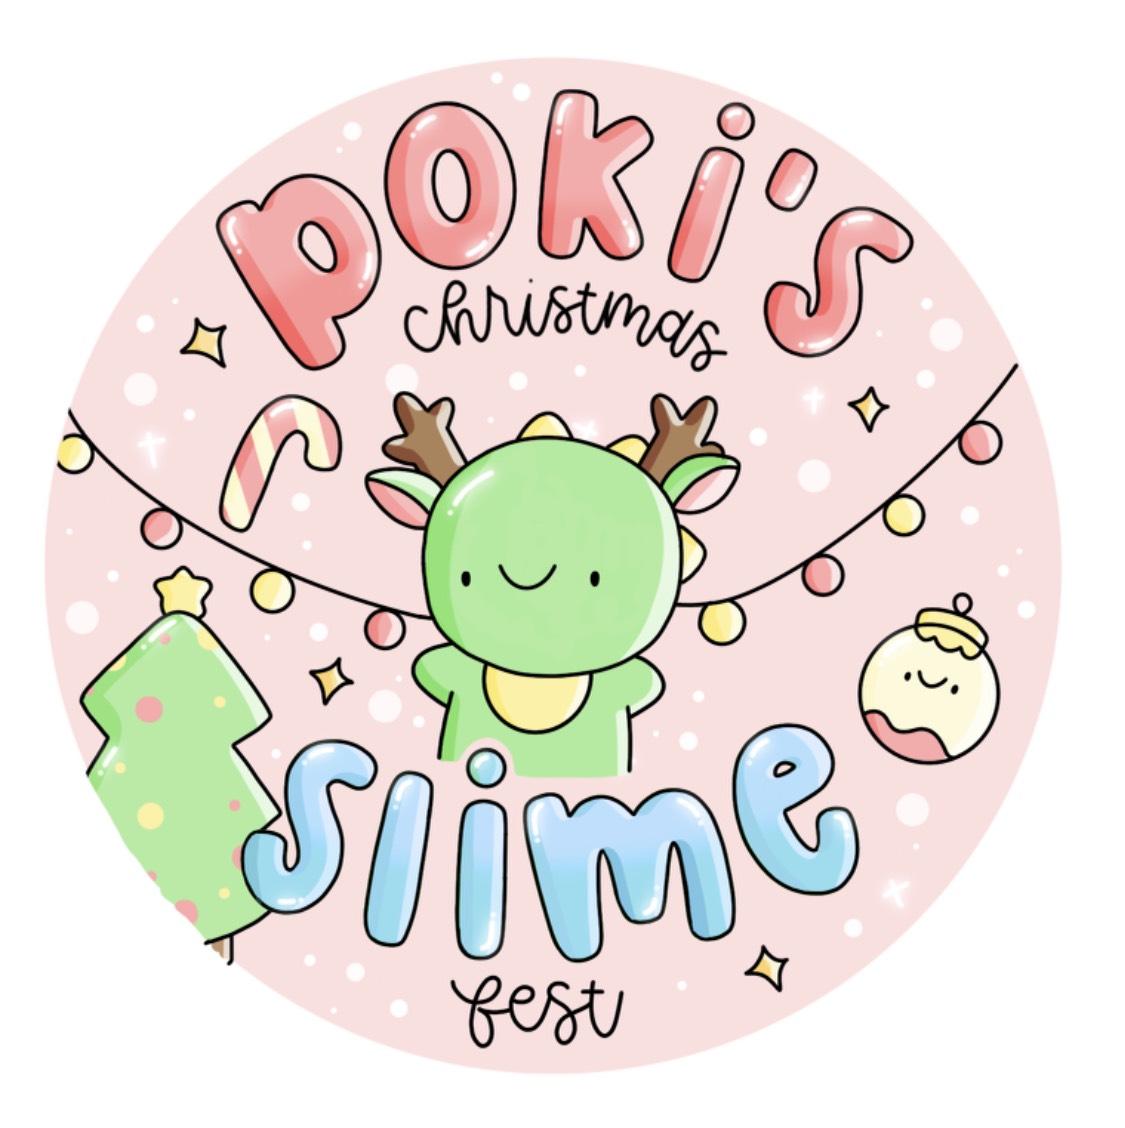 Poki's-Christimas Slime Fest